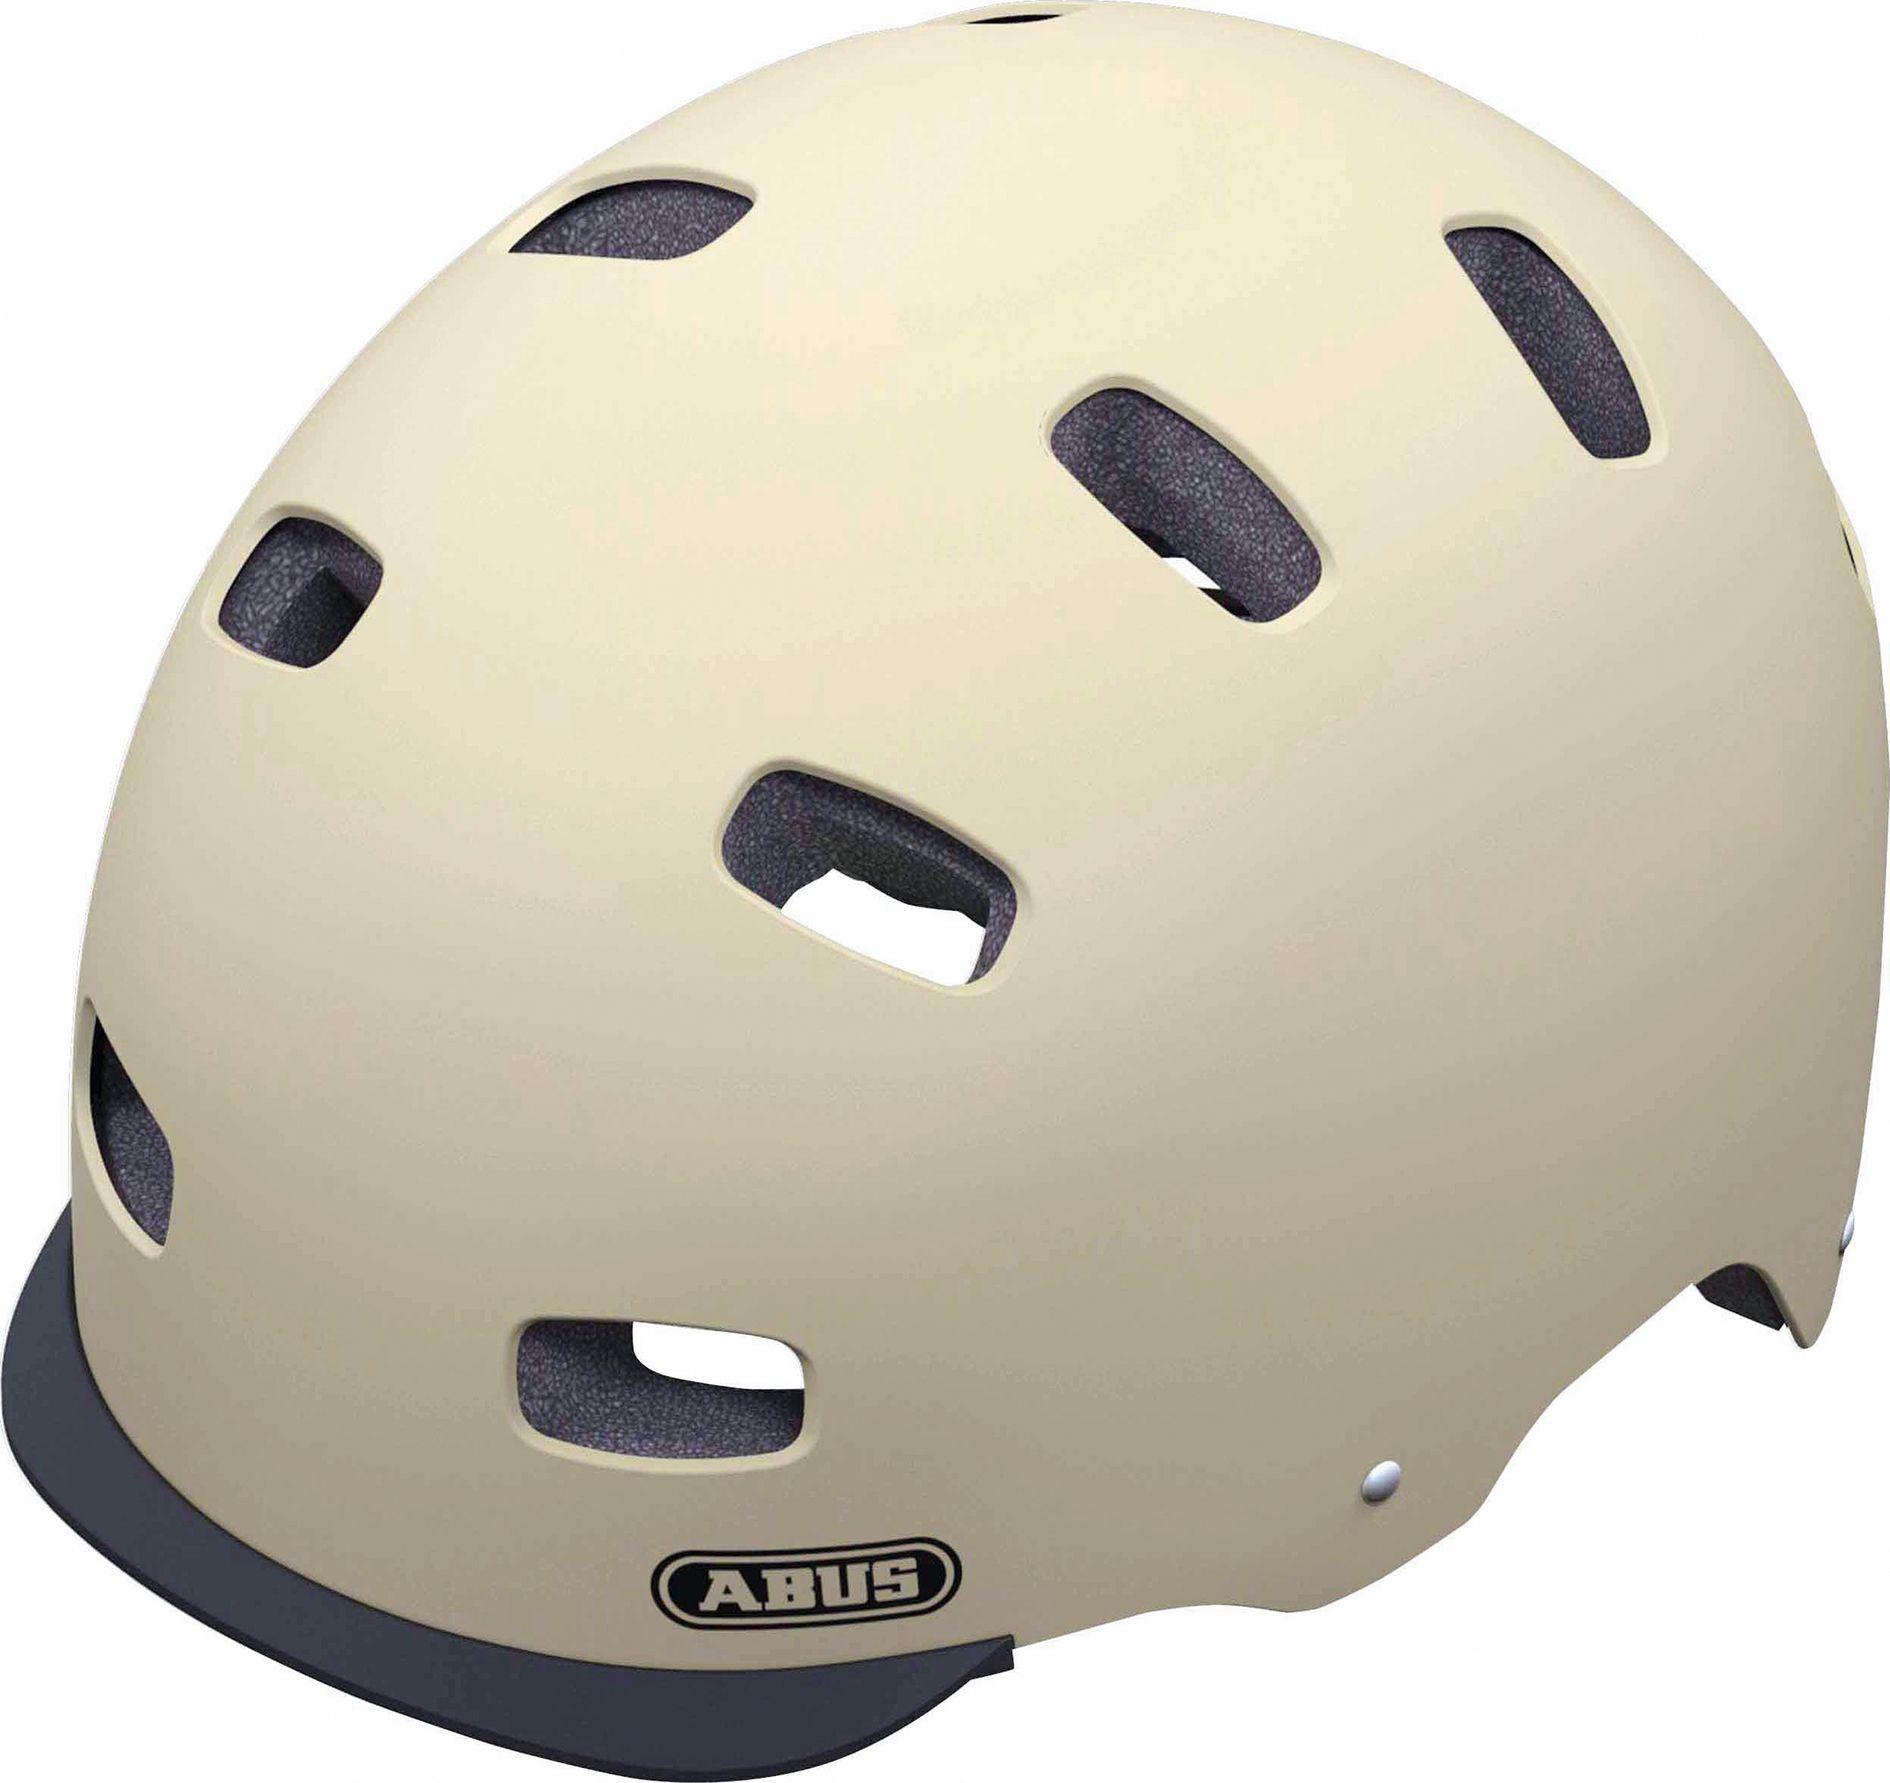 Pin en ABUS cascos urbanos colores